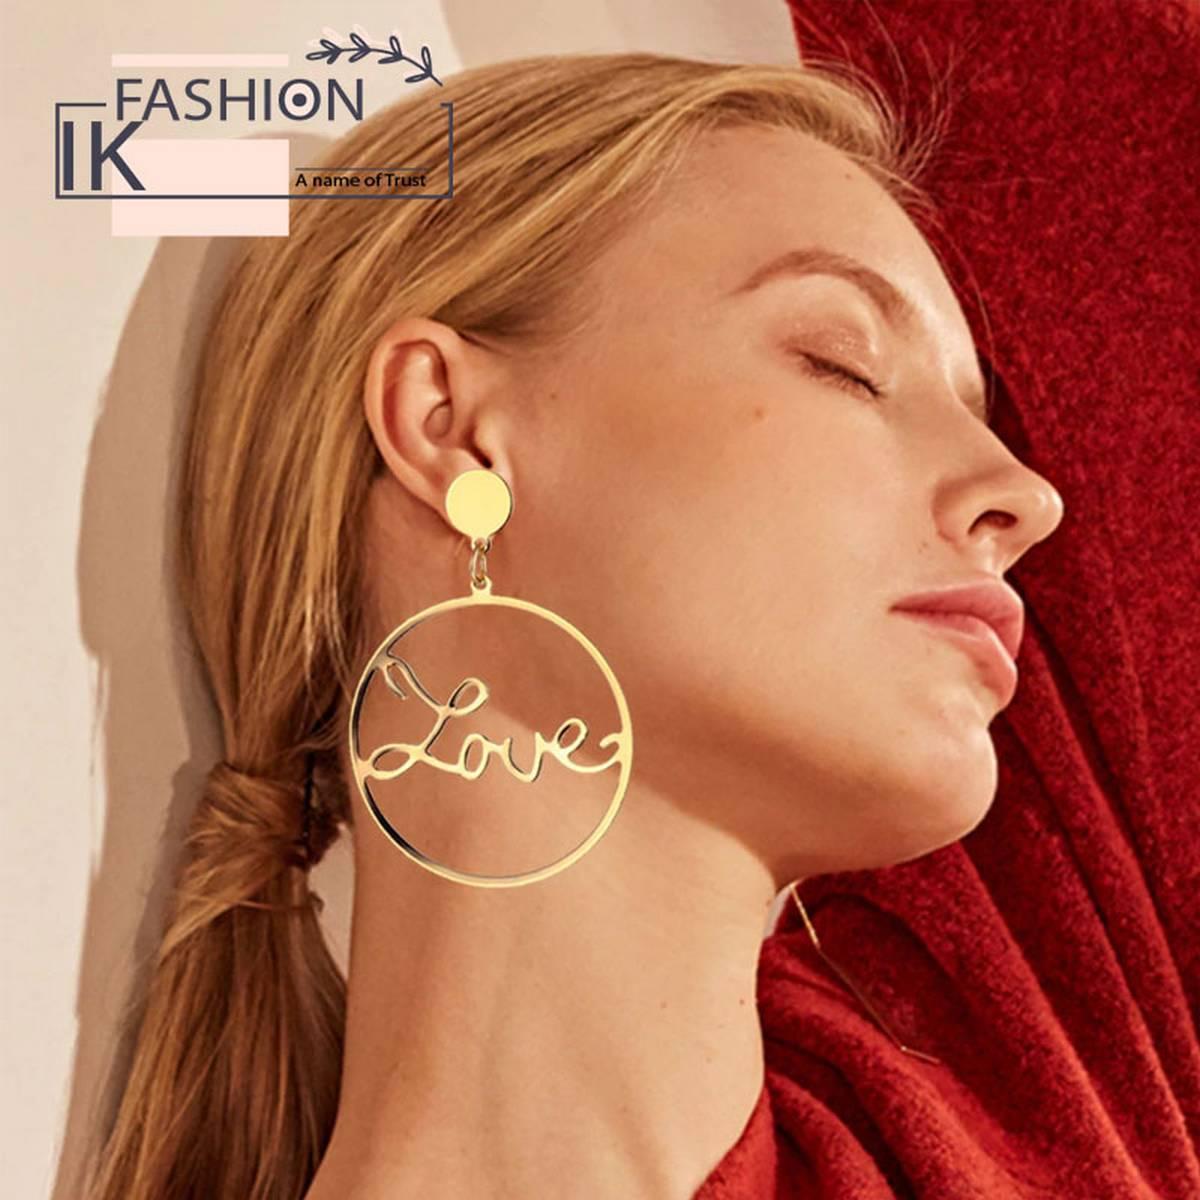 IK Fashion - Big Circle Hollow LOVE Earrings for Women Geometric Round Bohemian Dangle Earrings 2019 Trendy Statement Jewelry